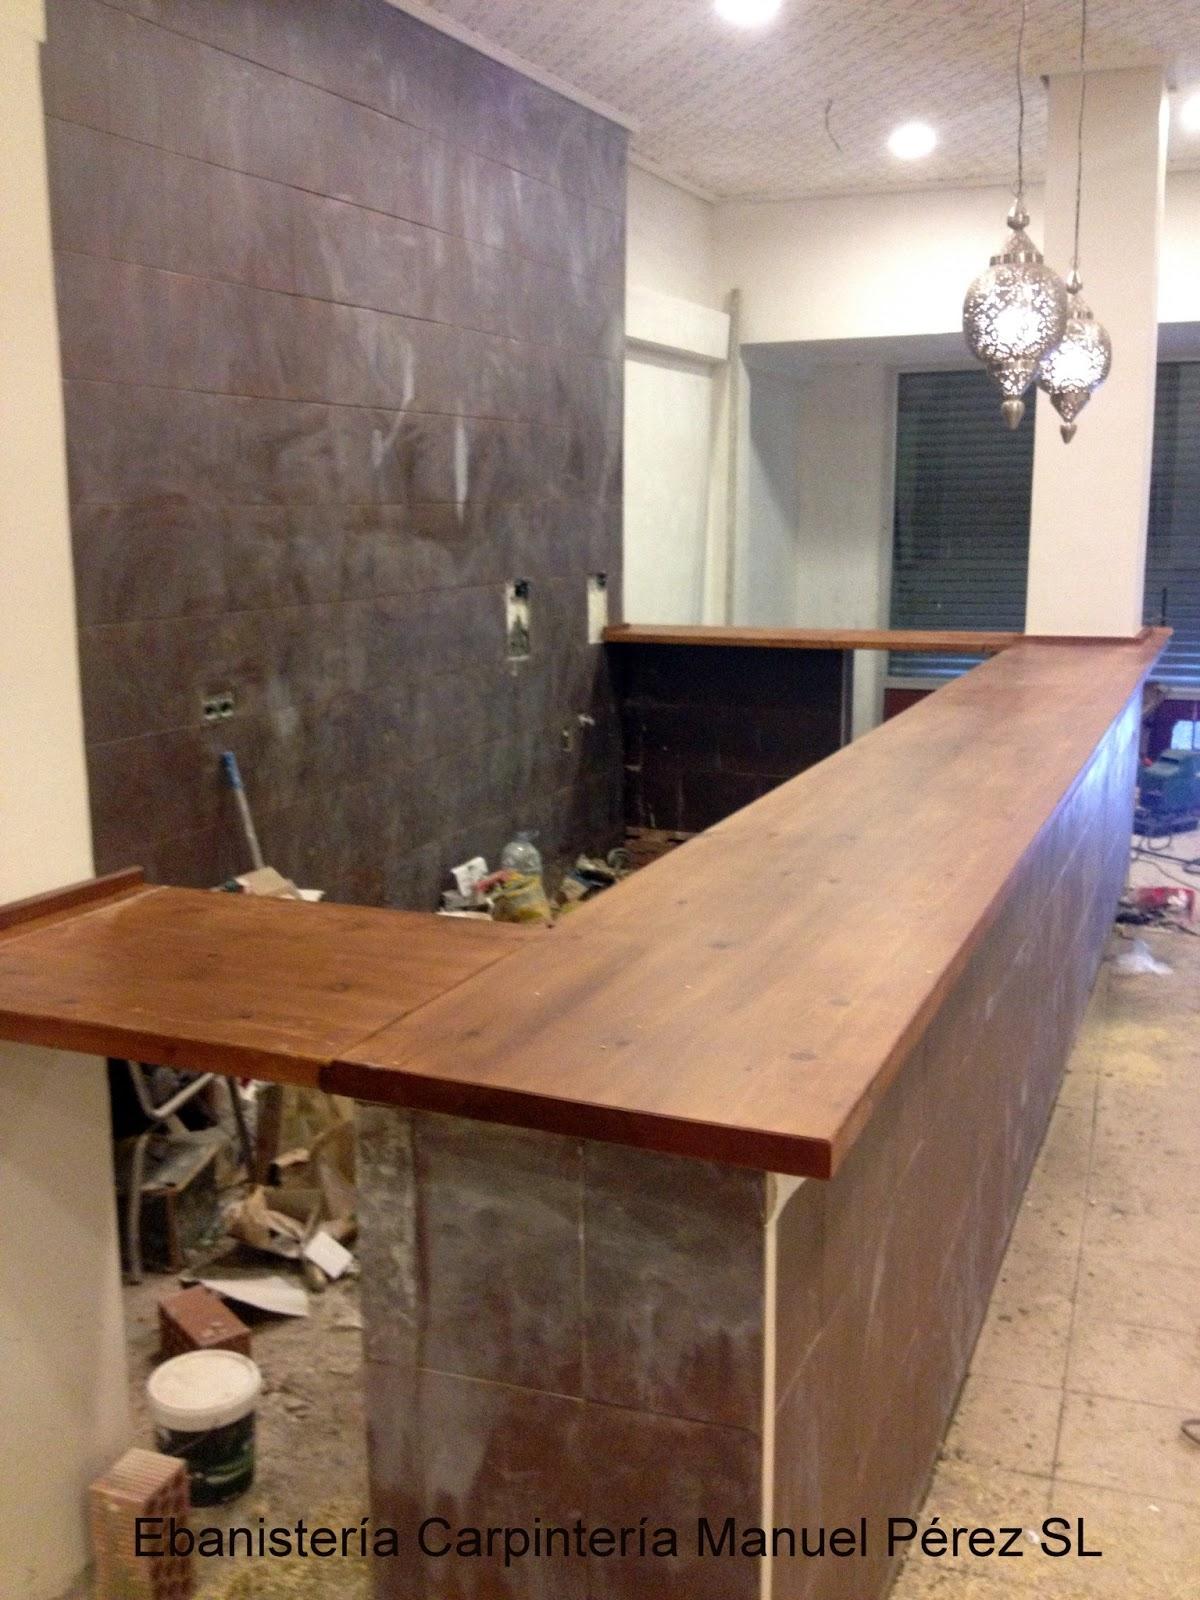 Ebanisteria carpinteria manuel perez zaragoza barra for Barras en madera para bar